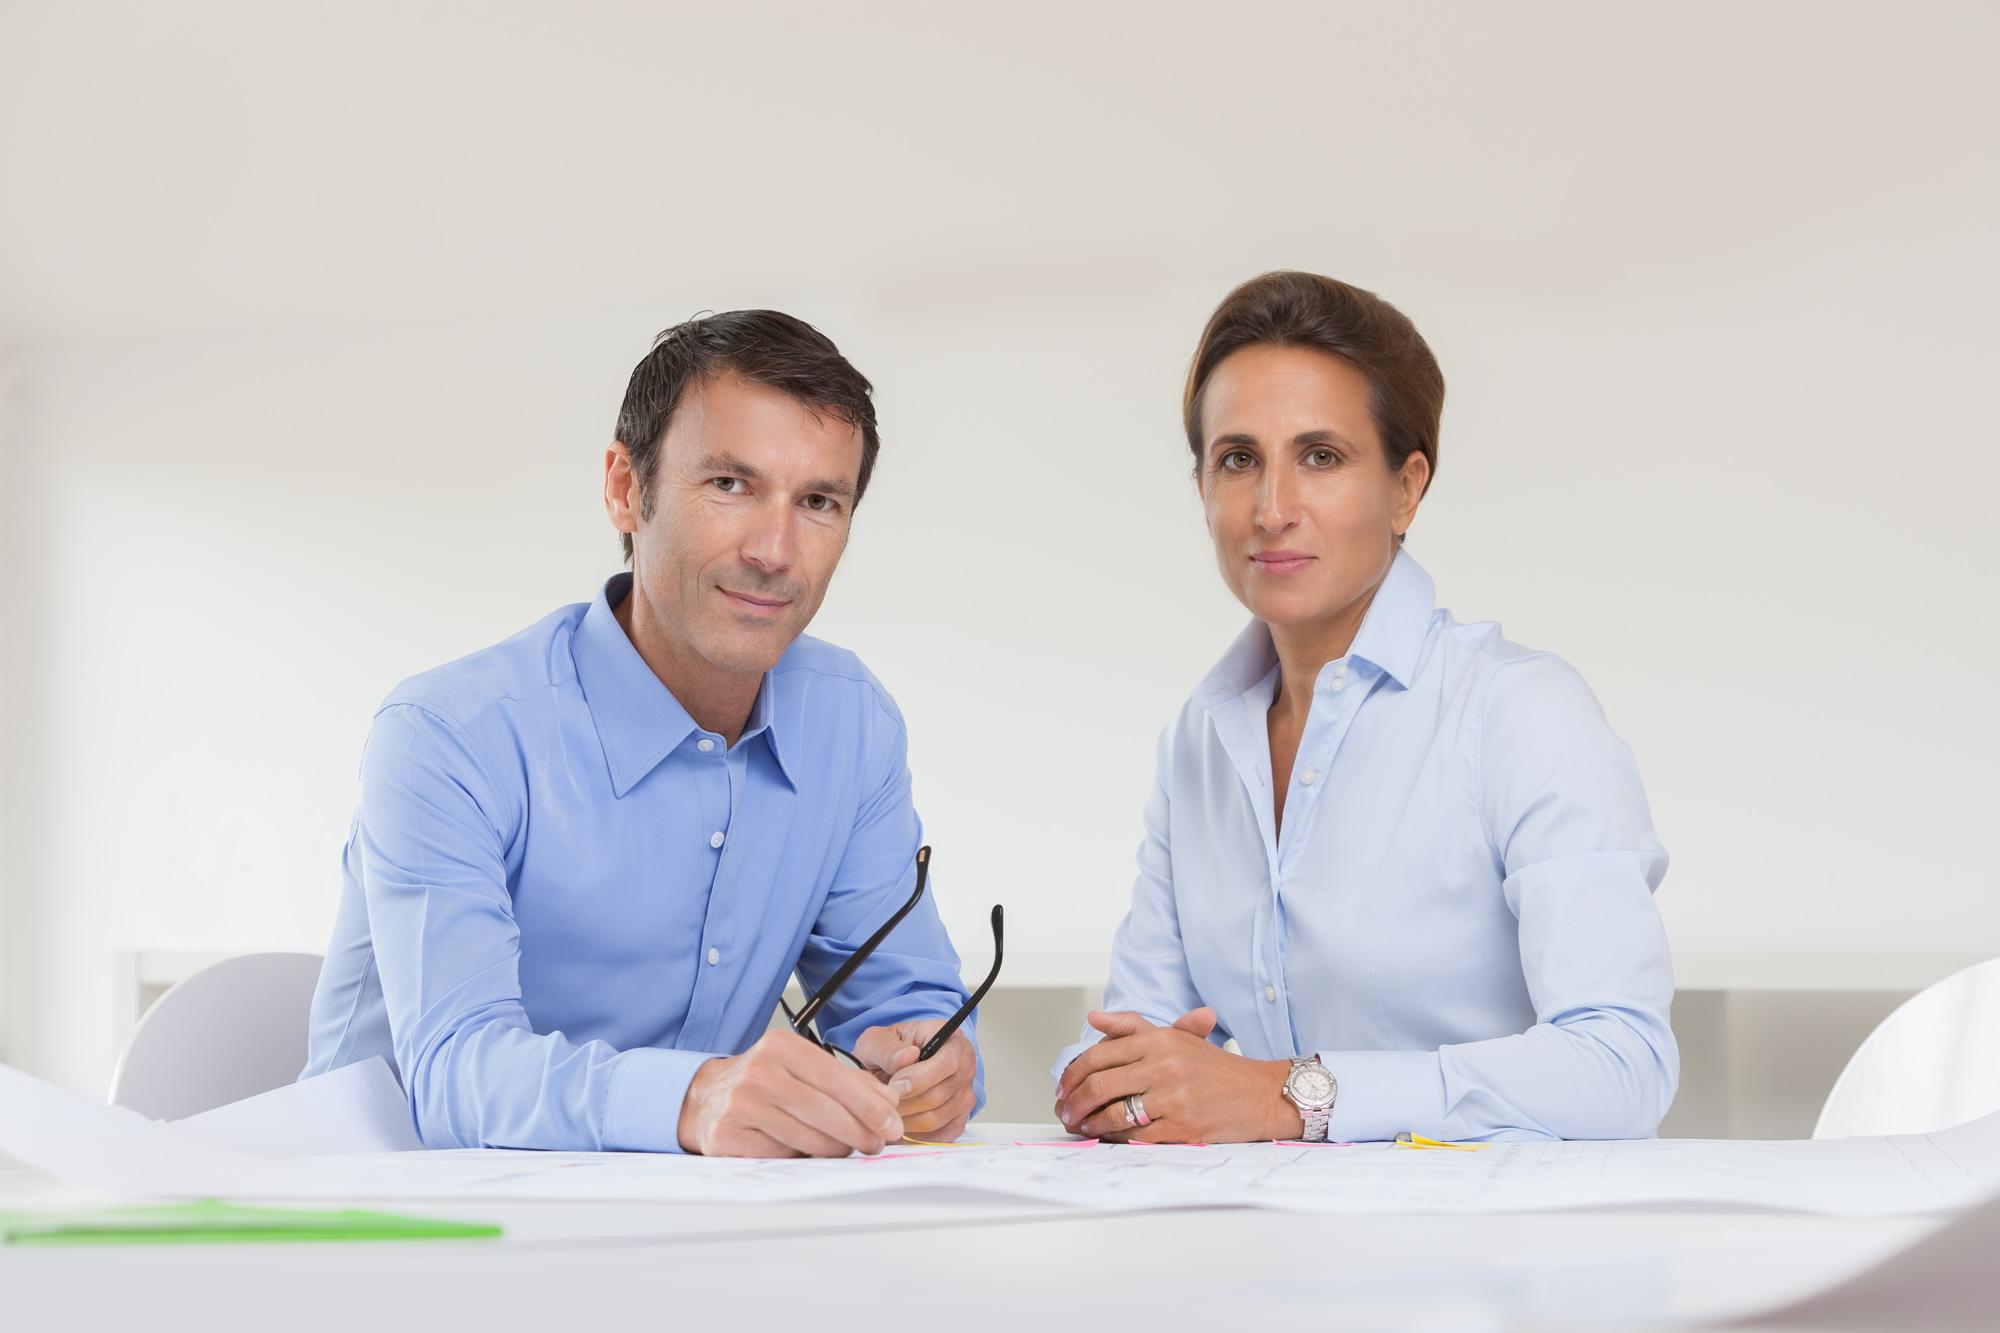 Nikolaus Gschlößl und Elvira Vogtherr am Beratungstisch